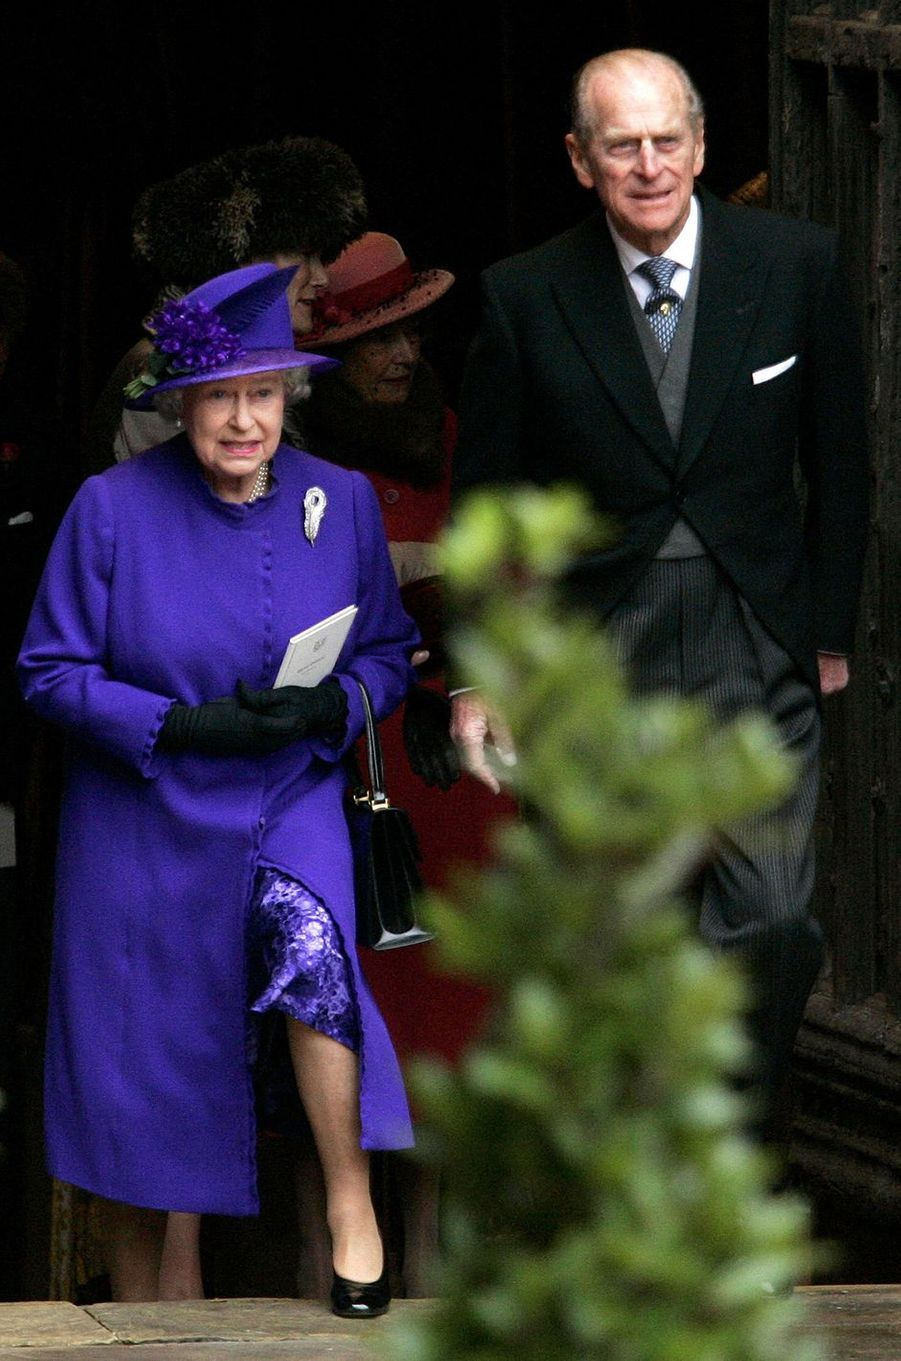 La reine Elizabeth II et le prince Philip au mariage de Lady Tamara Grosvenor, le 6 novembre 2004